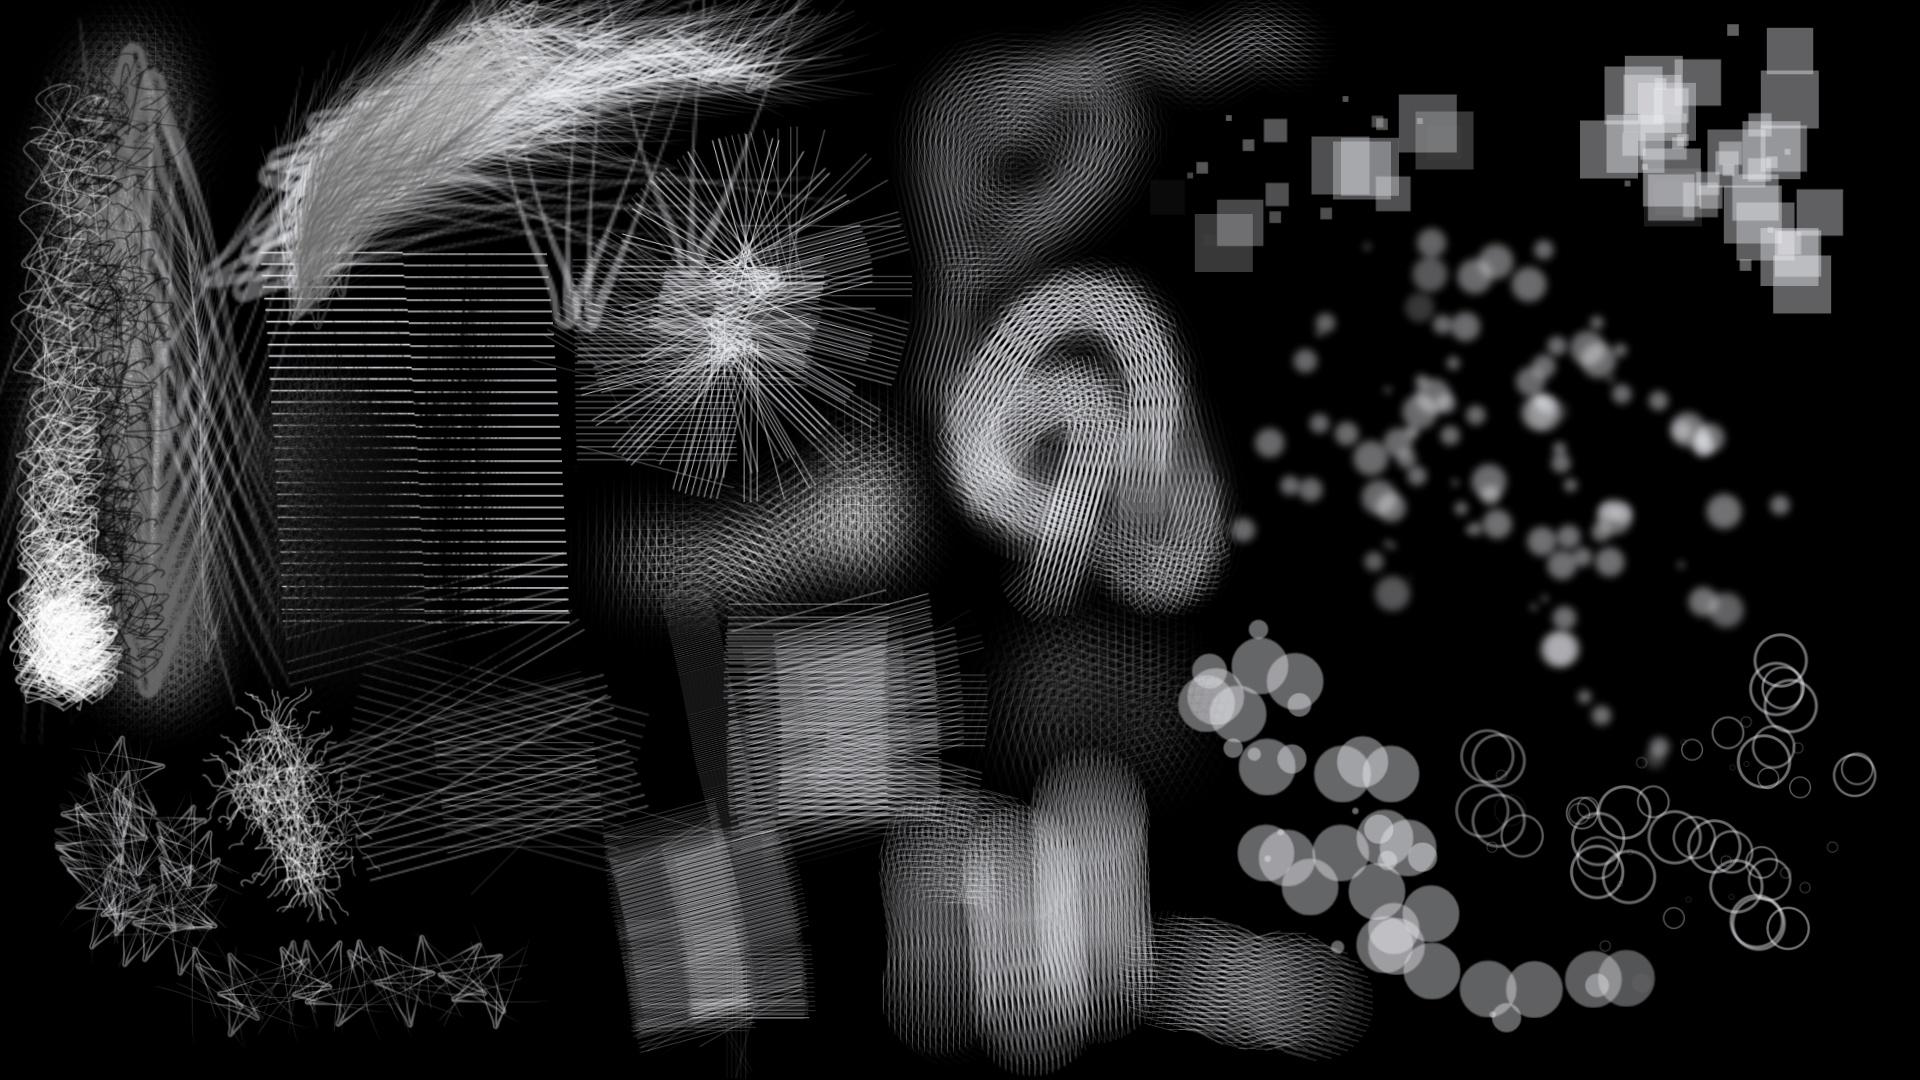 More GIMP brushes